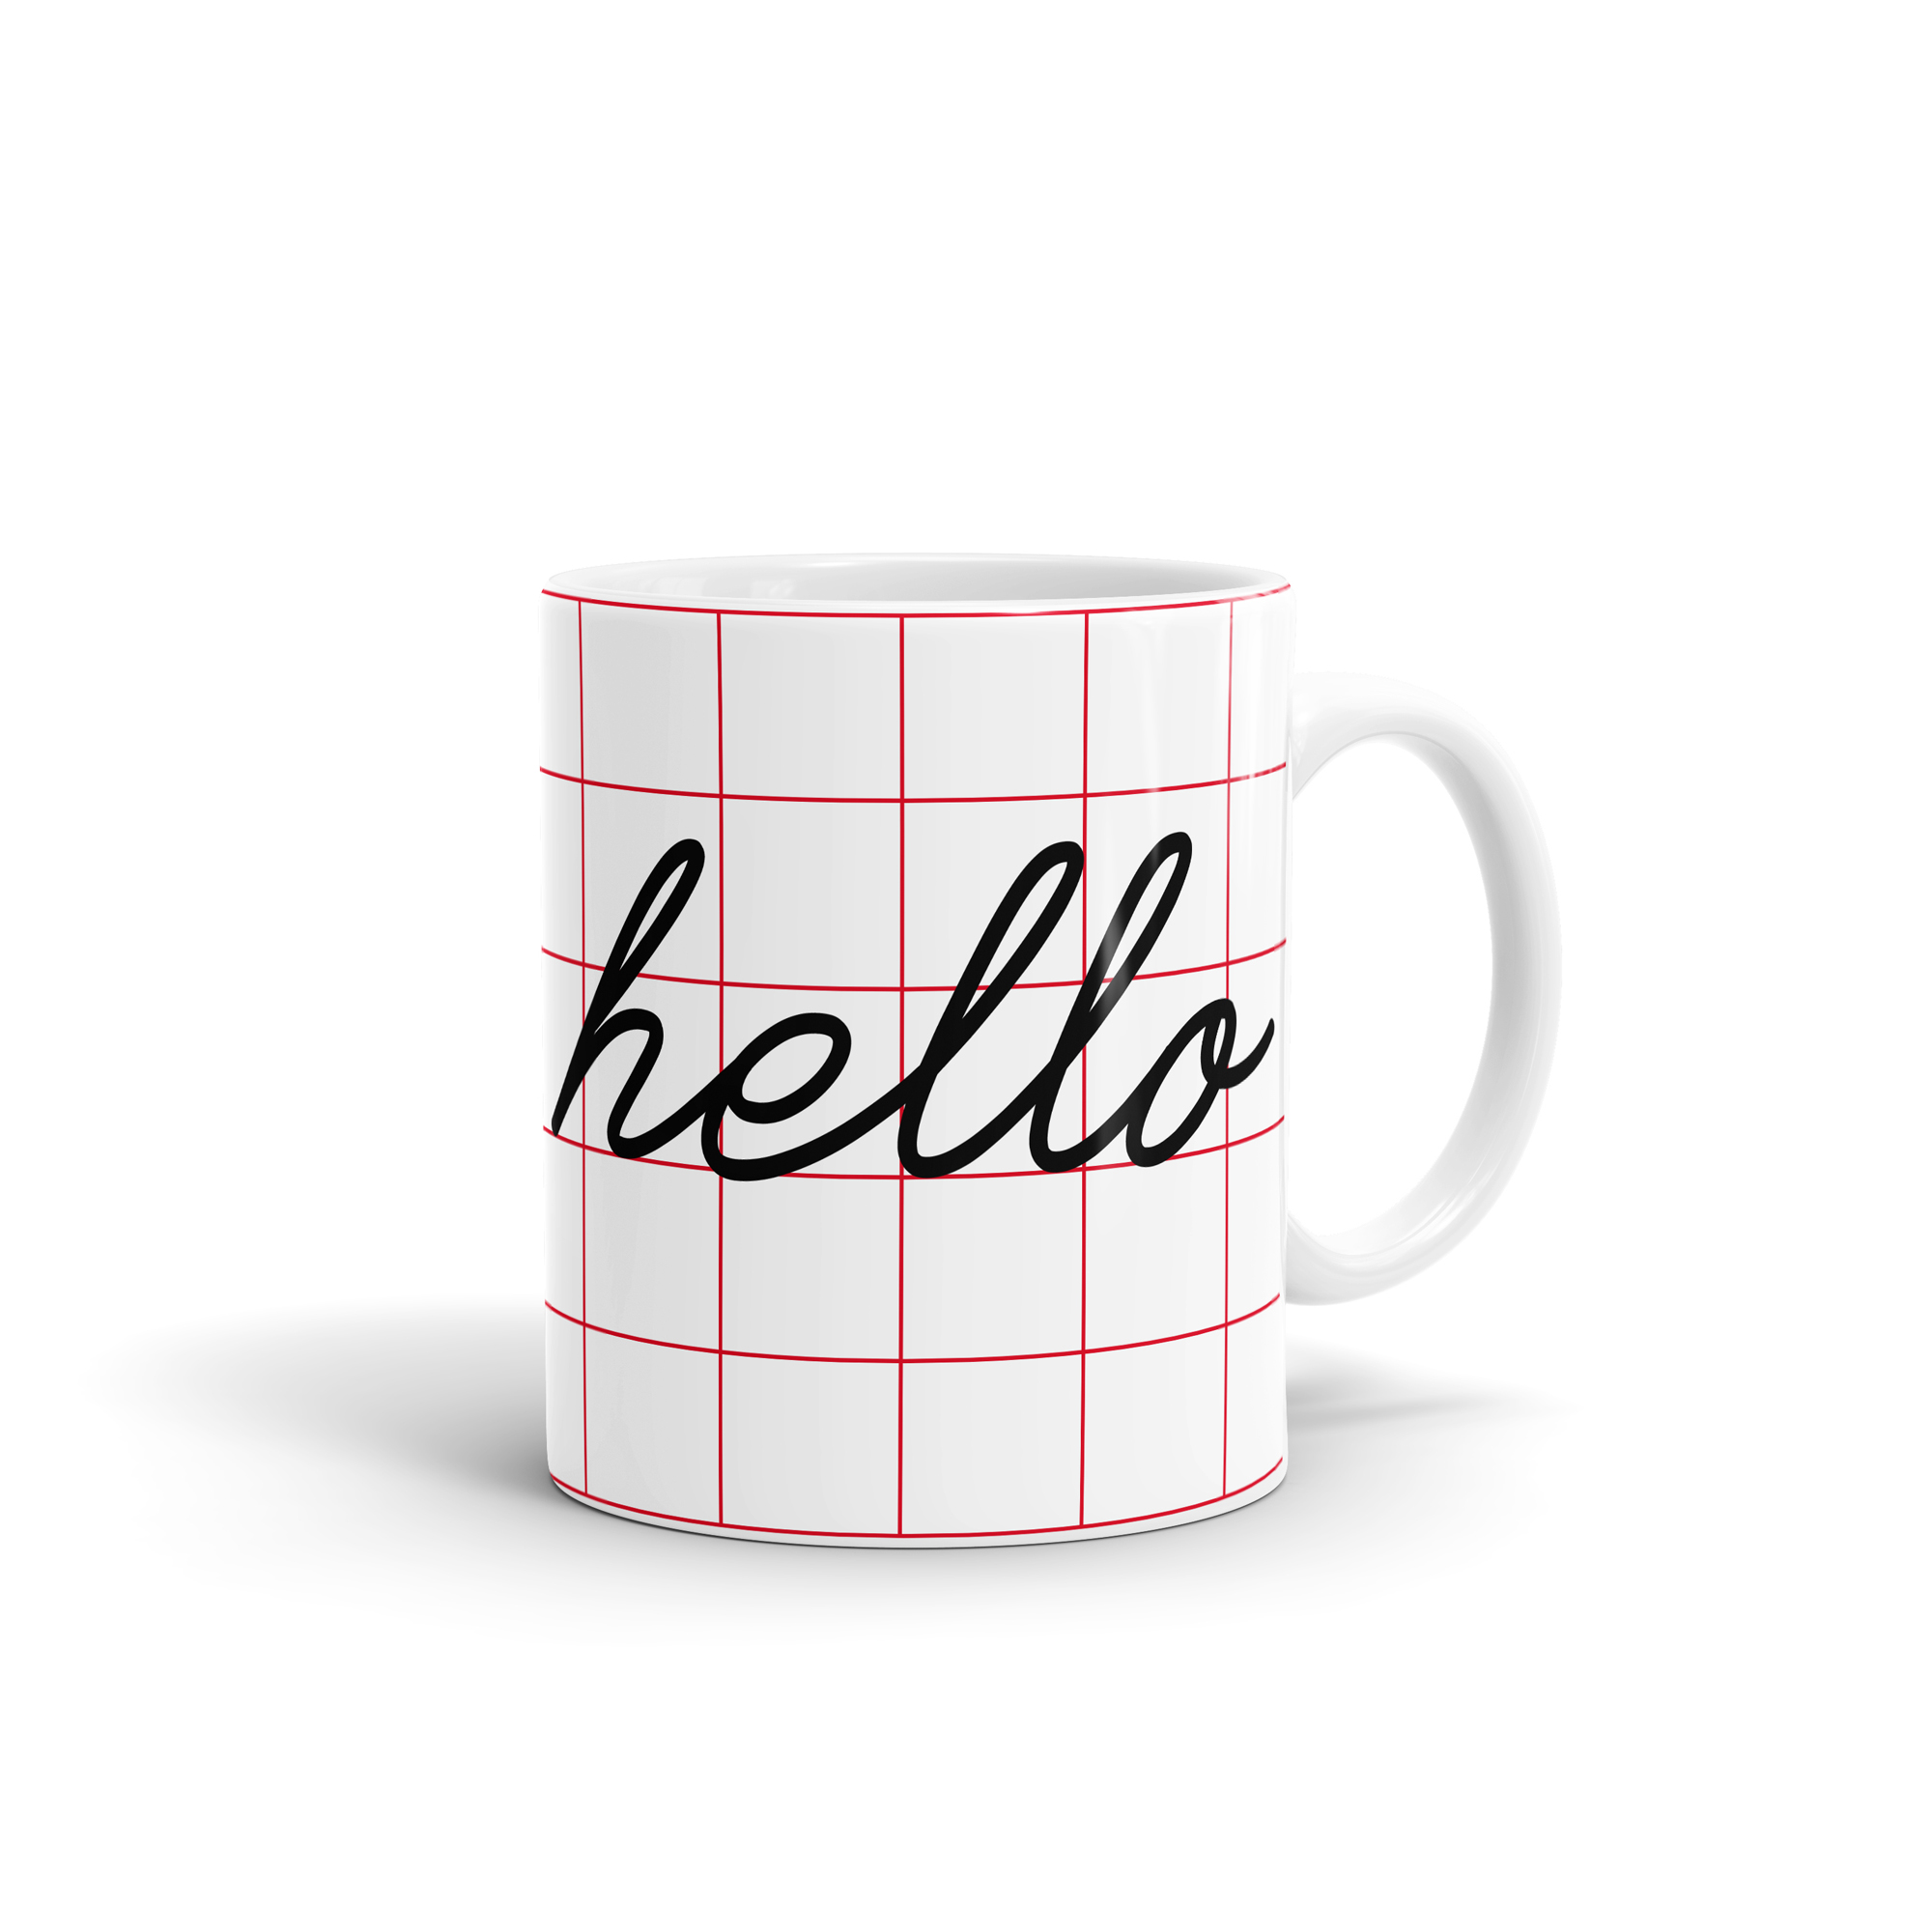 Hello Mug by WEEW Smart Design